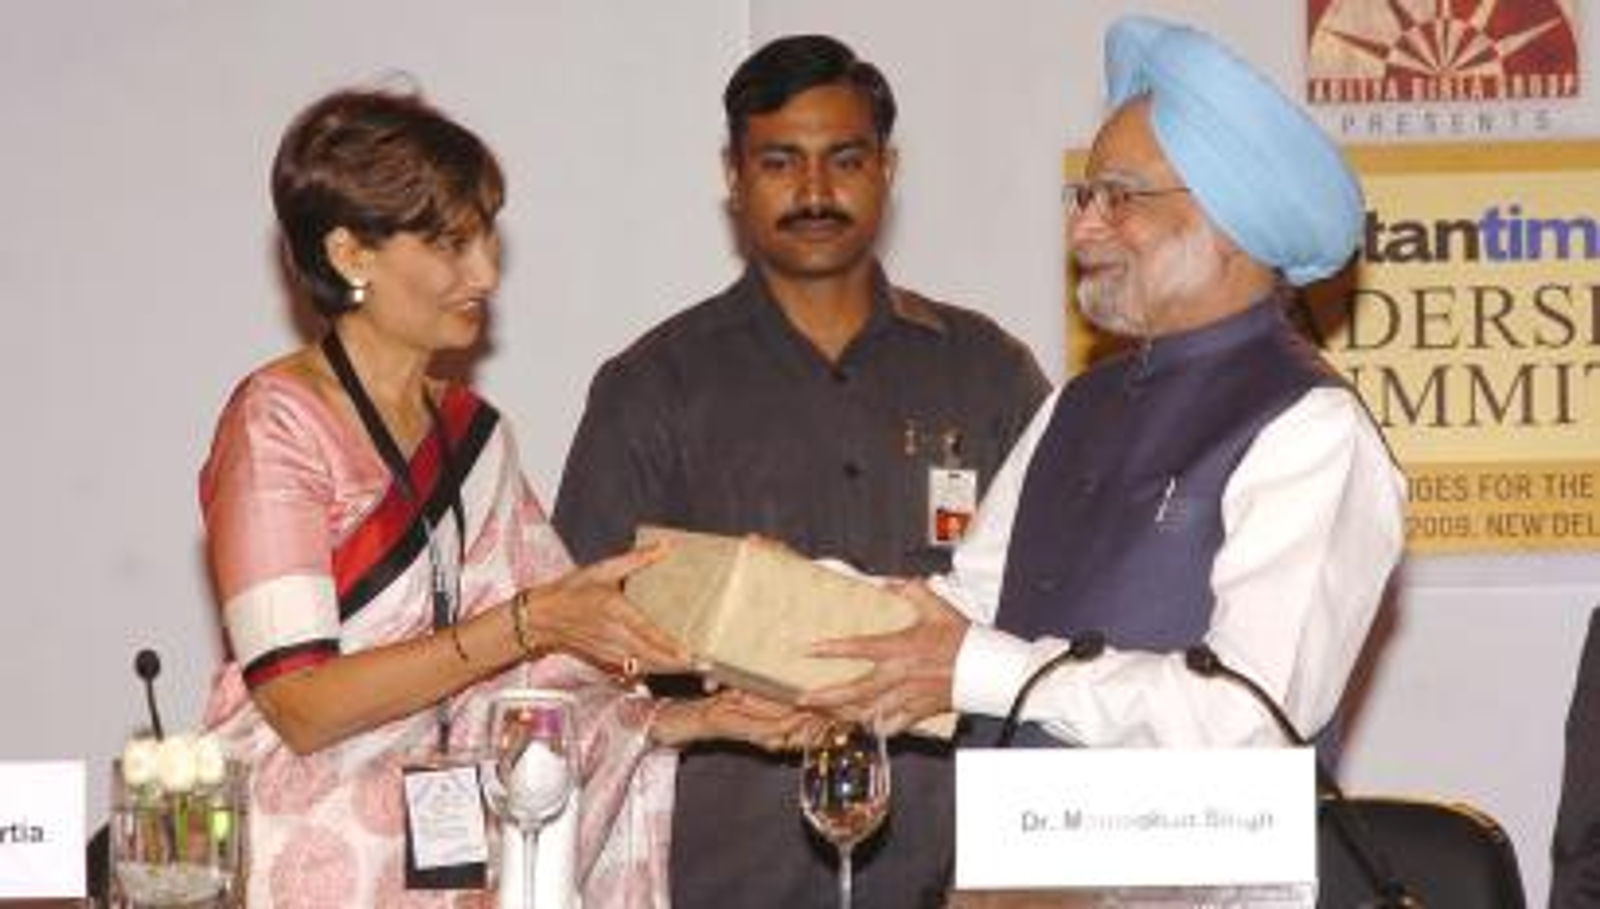 Shobhana Bhartia-Forbes Most powerful